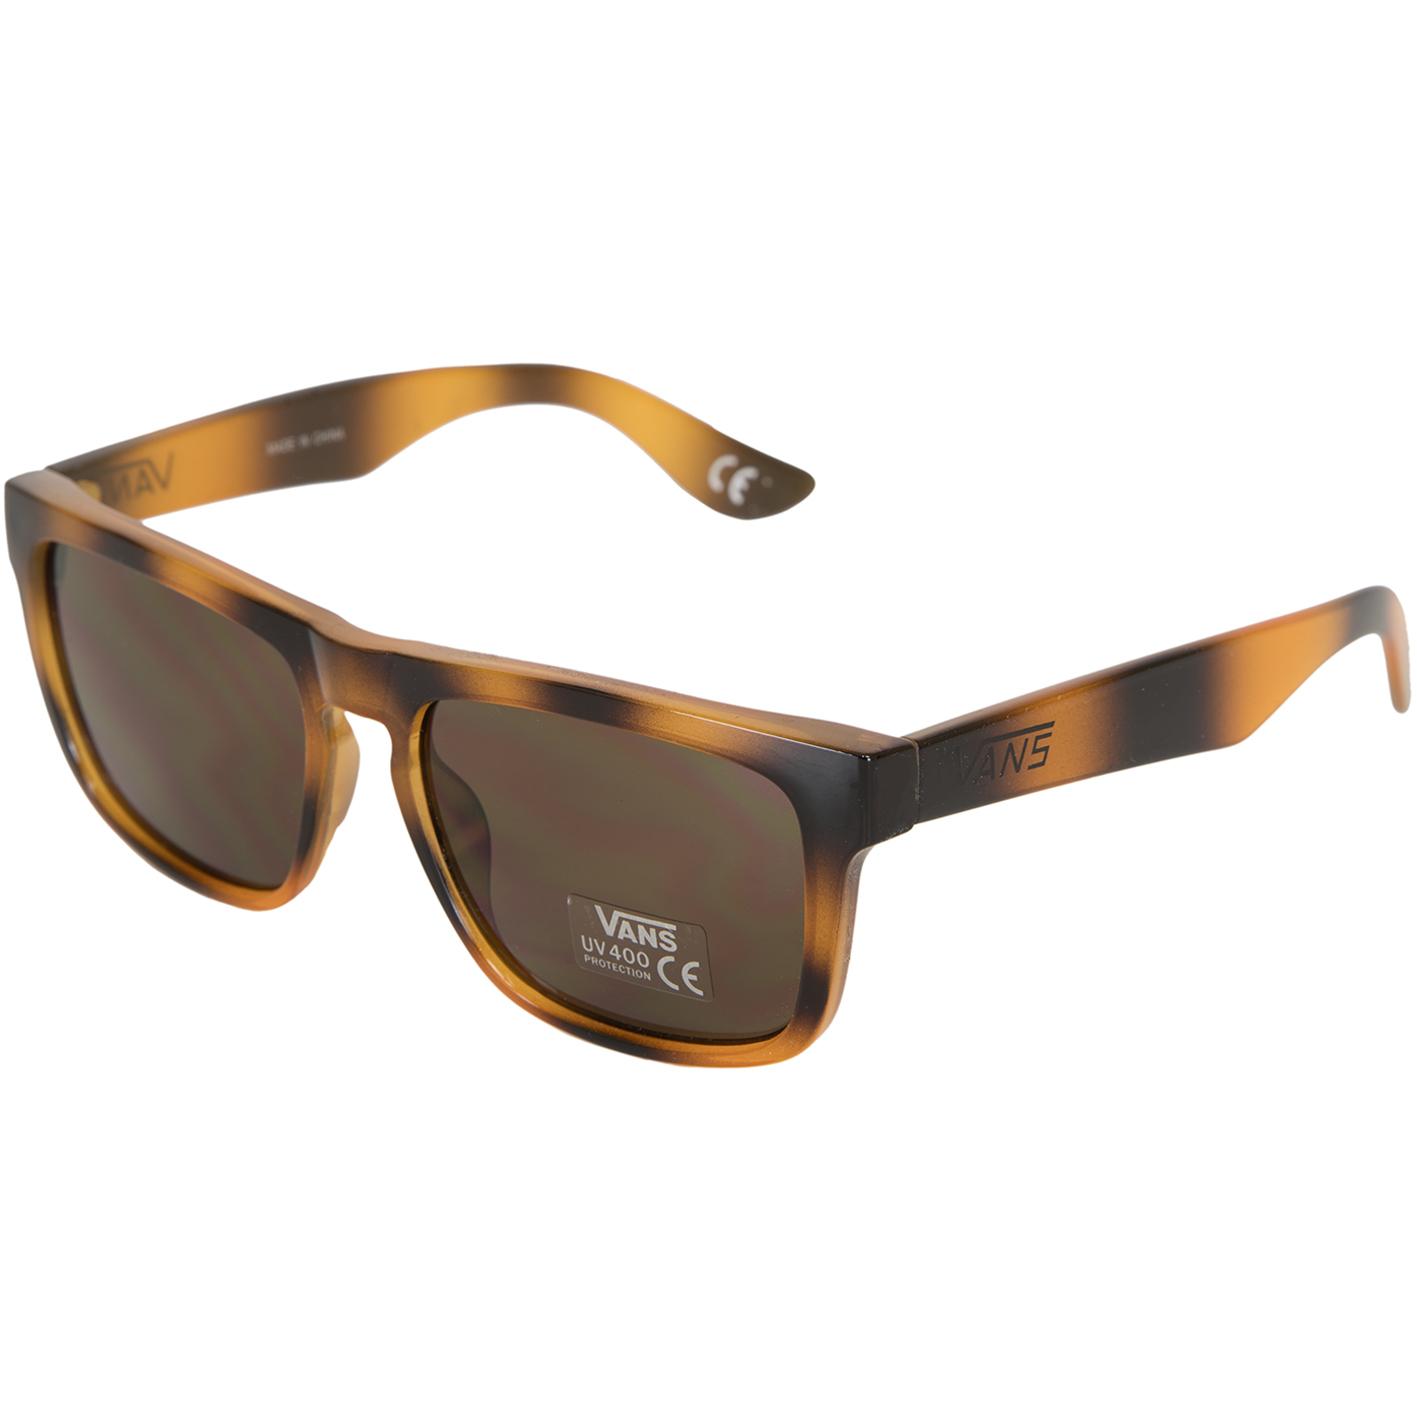 Vans Sonnenbrille Squared Off, UV 400, brown tortoise braun